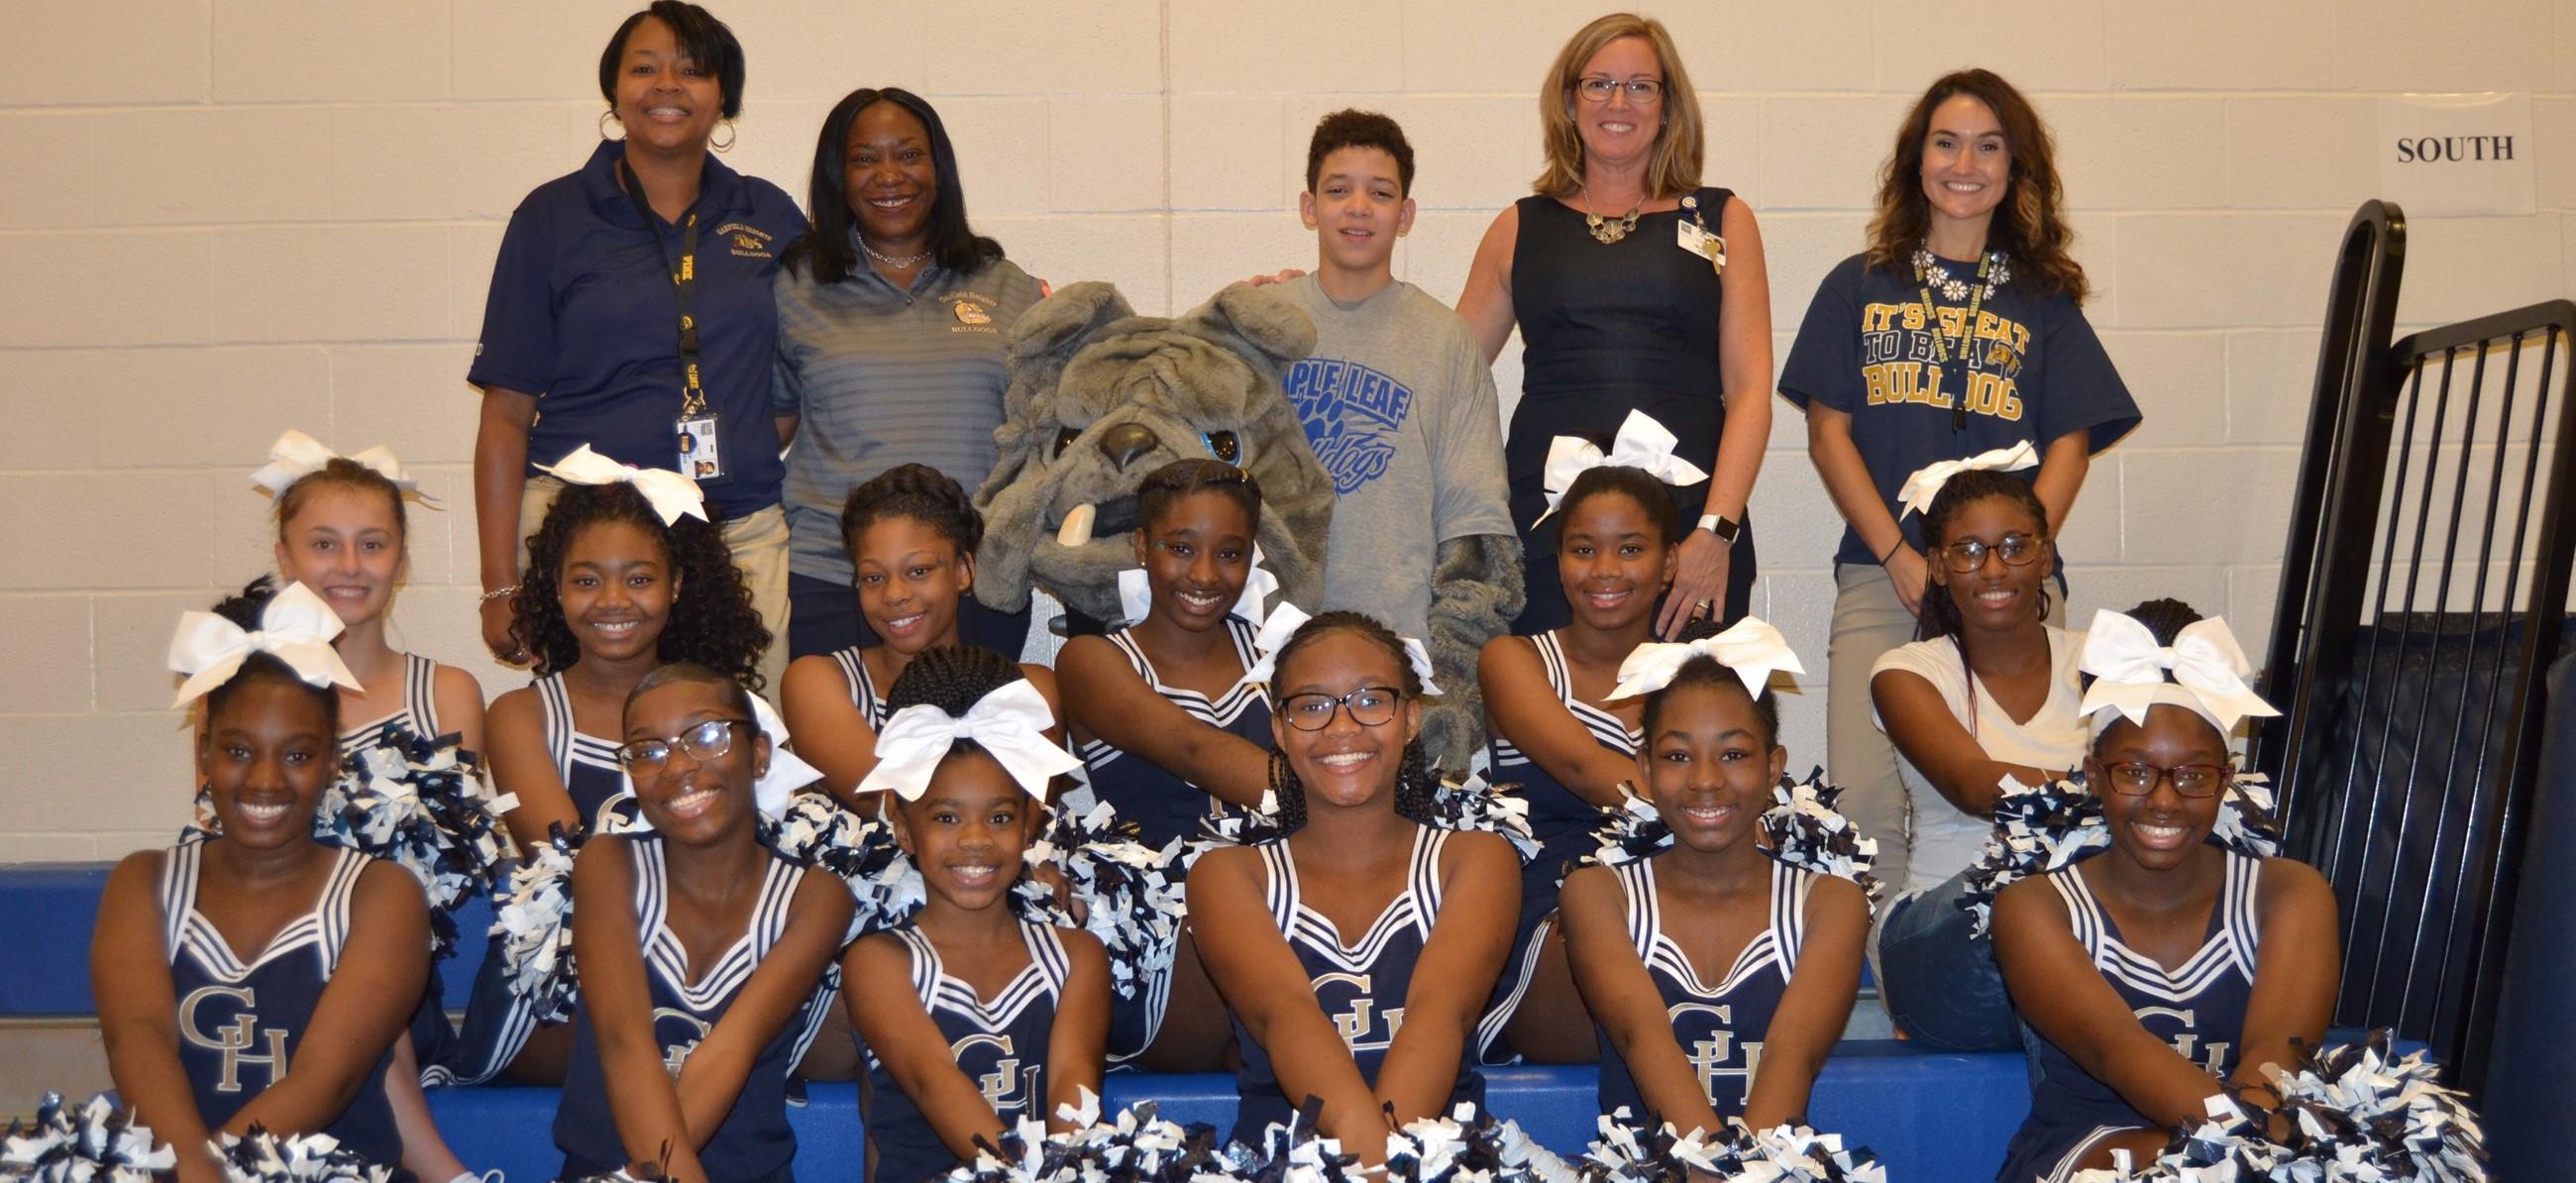 Middle School cheerleaders at Maple Leaf